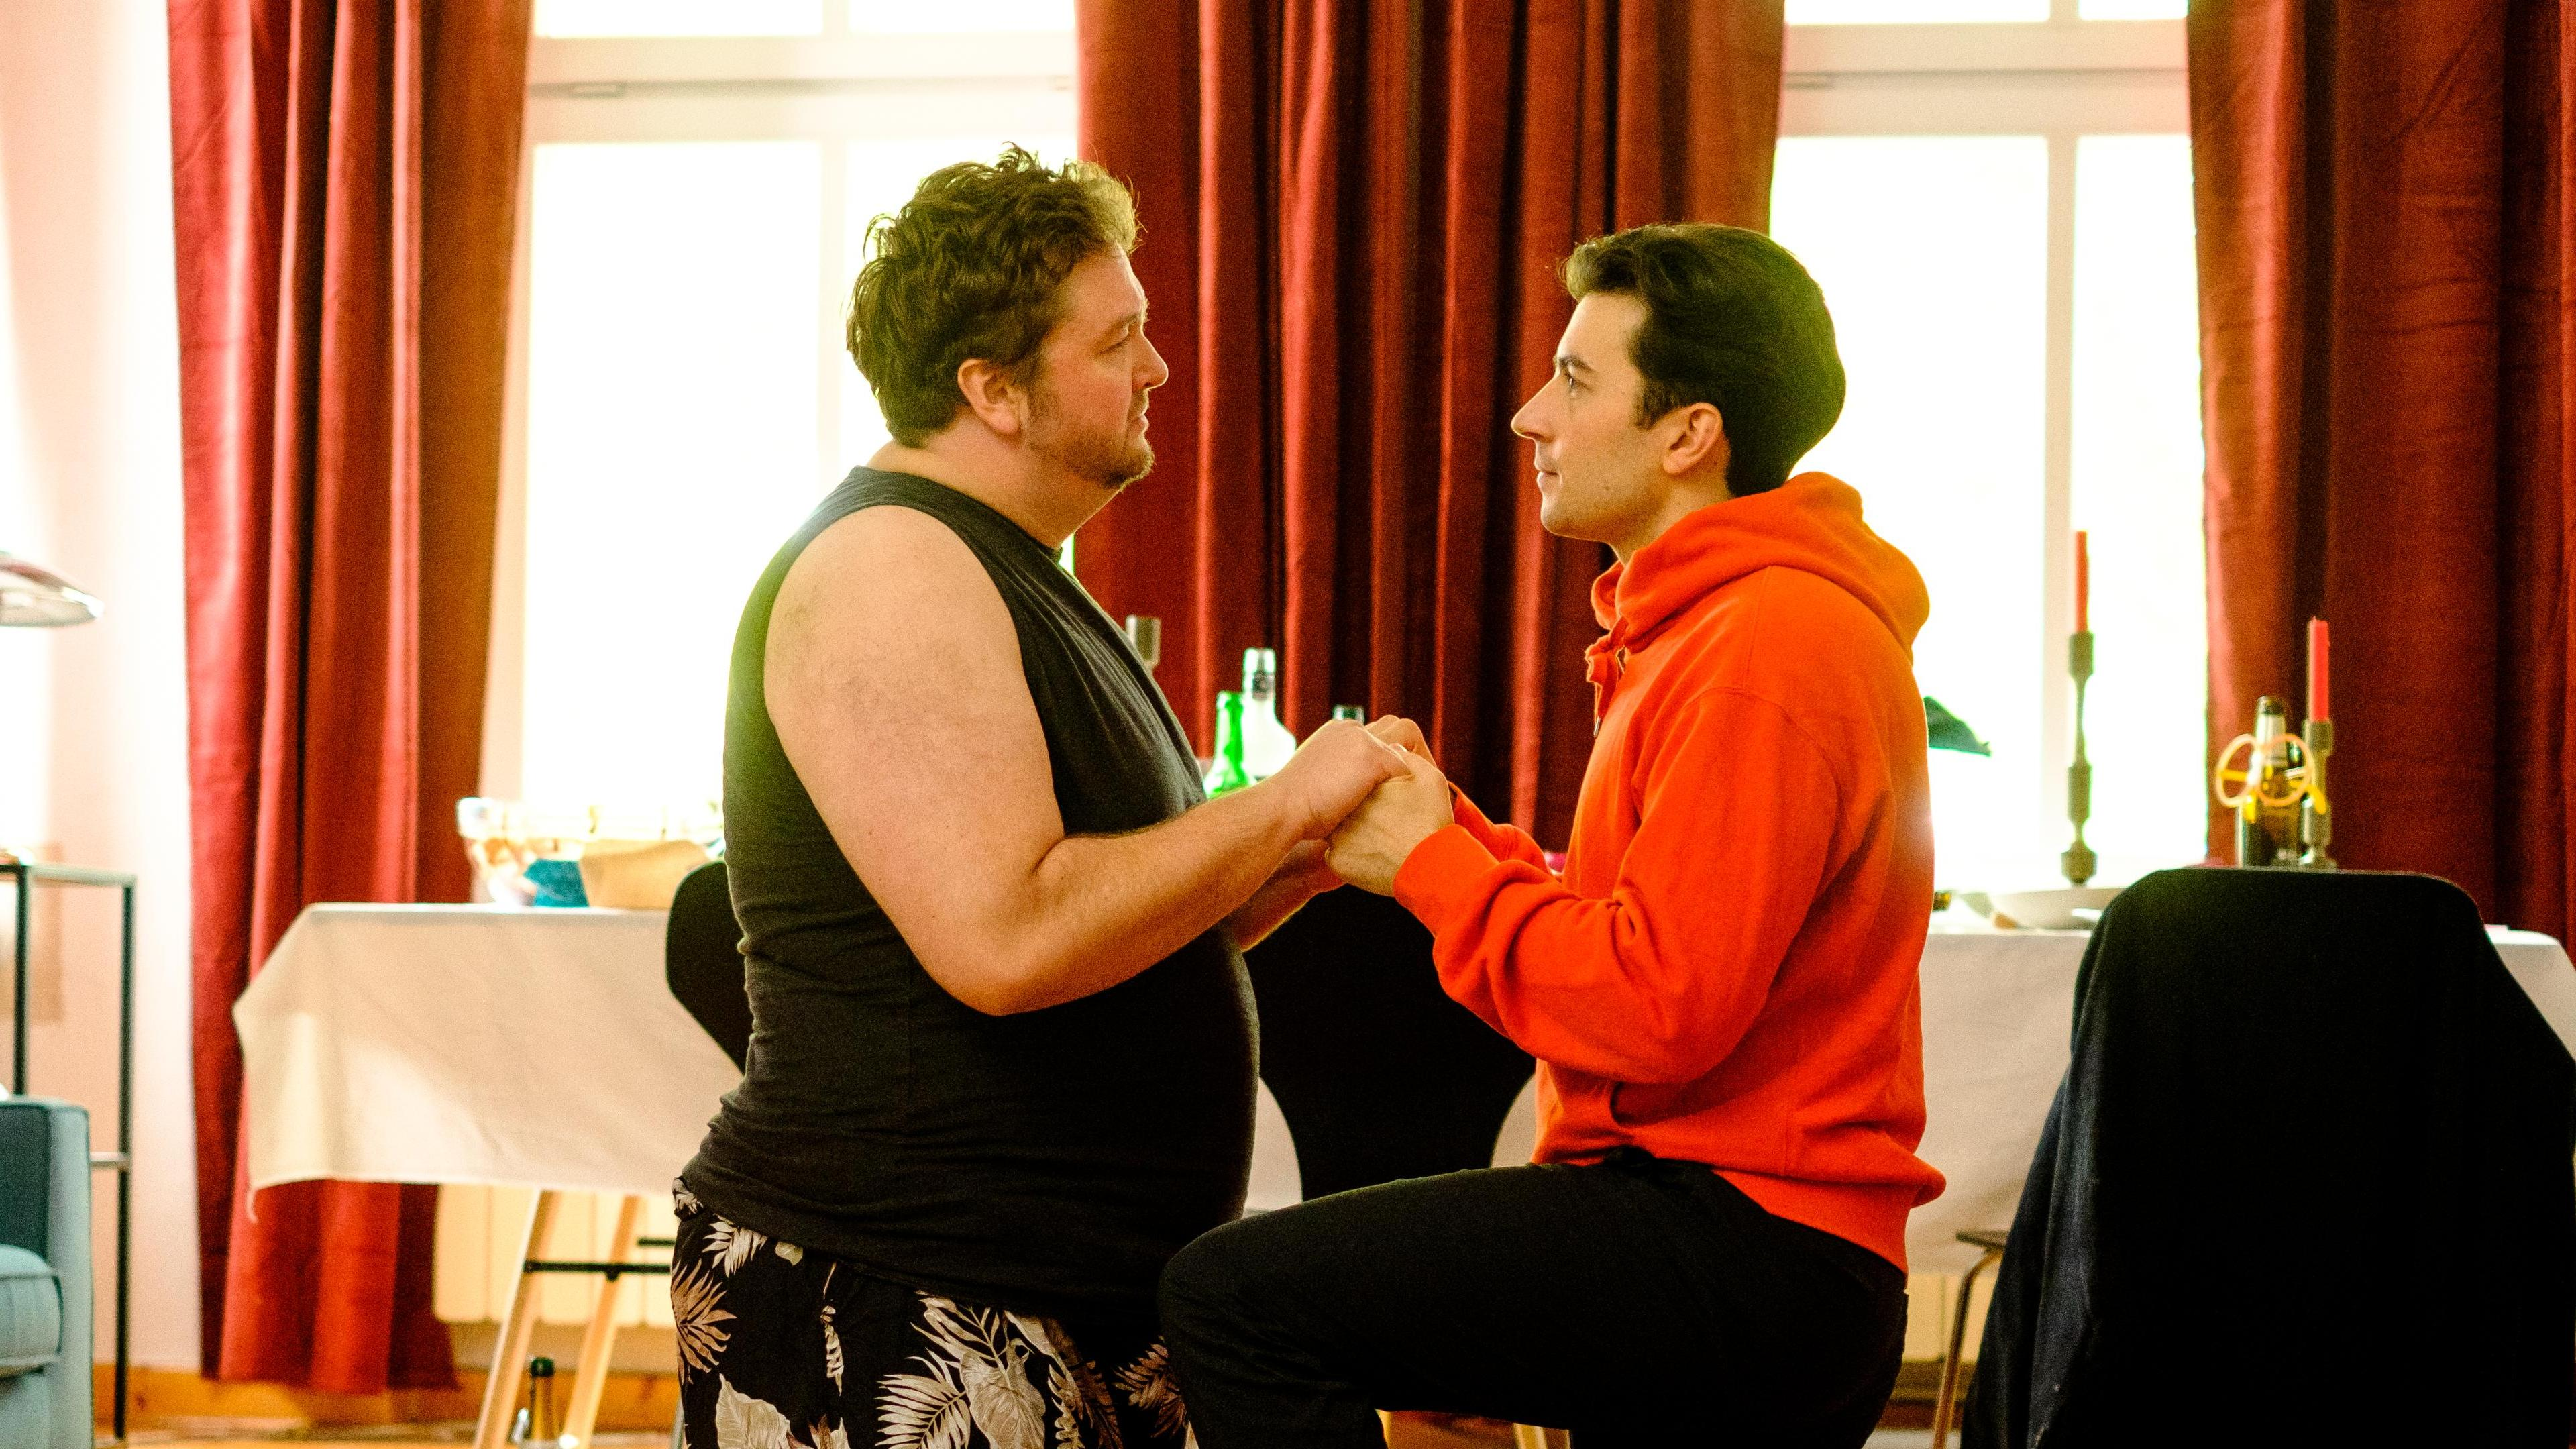 Daniel Zillmann and David Brizzi in Liebe. Jetzt! (2020)